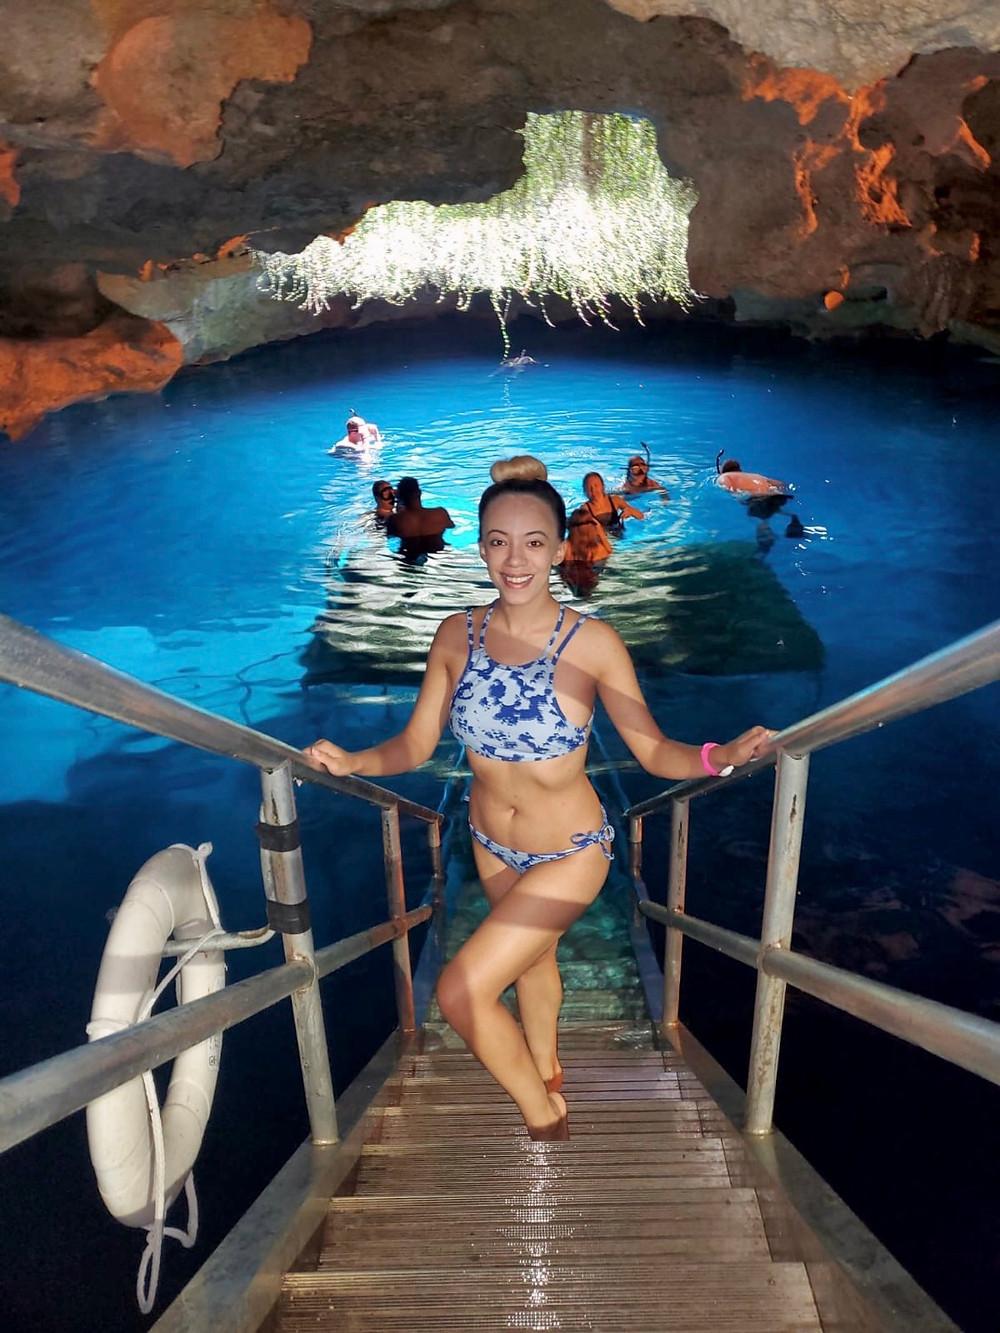 Florida-travel-blogger-Katrina-Belle-Florida-Devils-Den-Springs